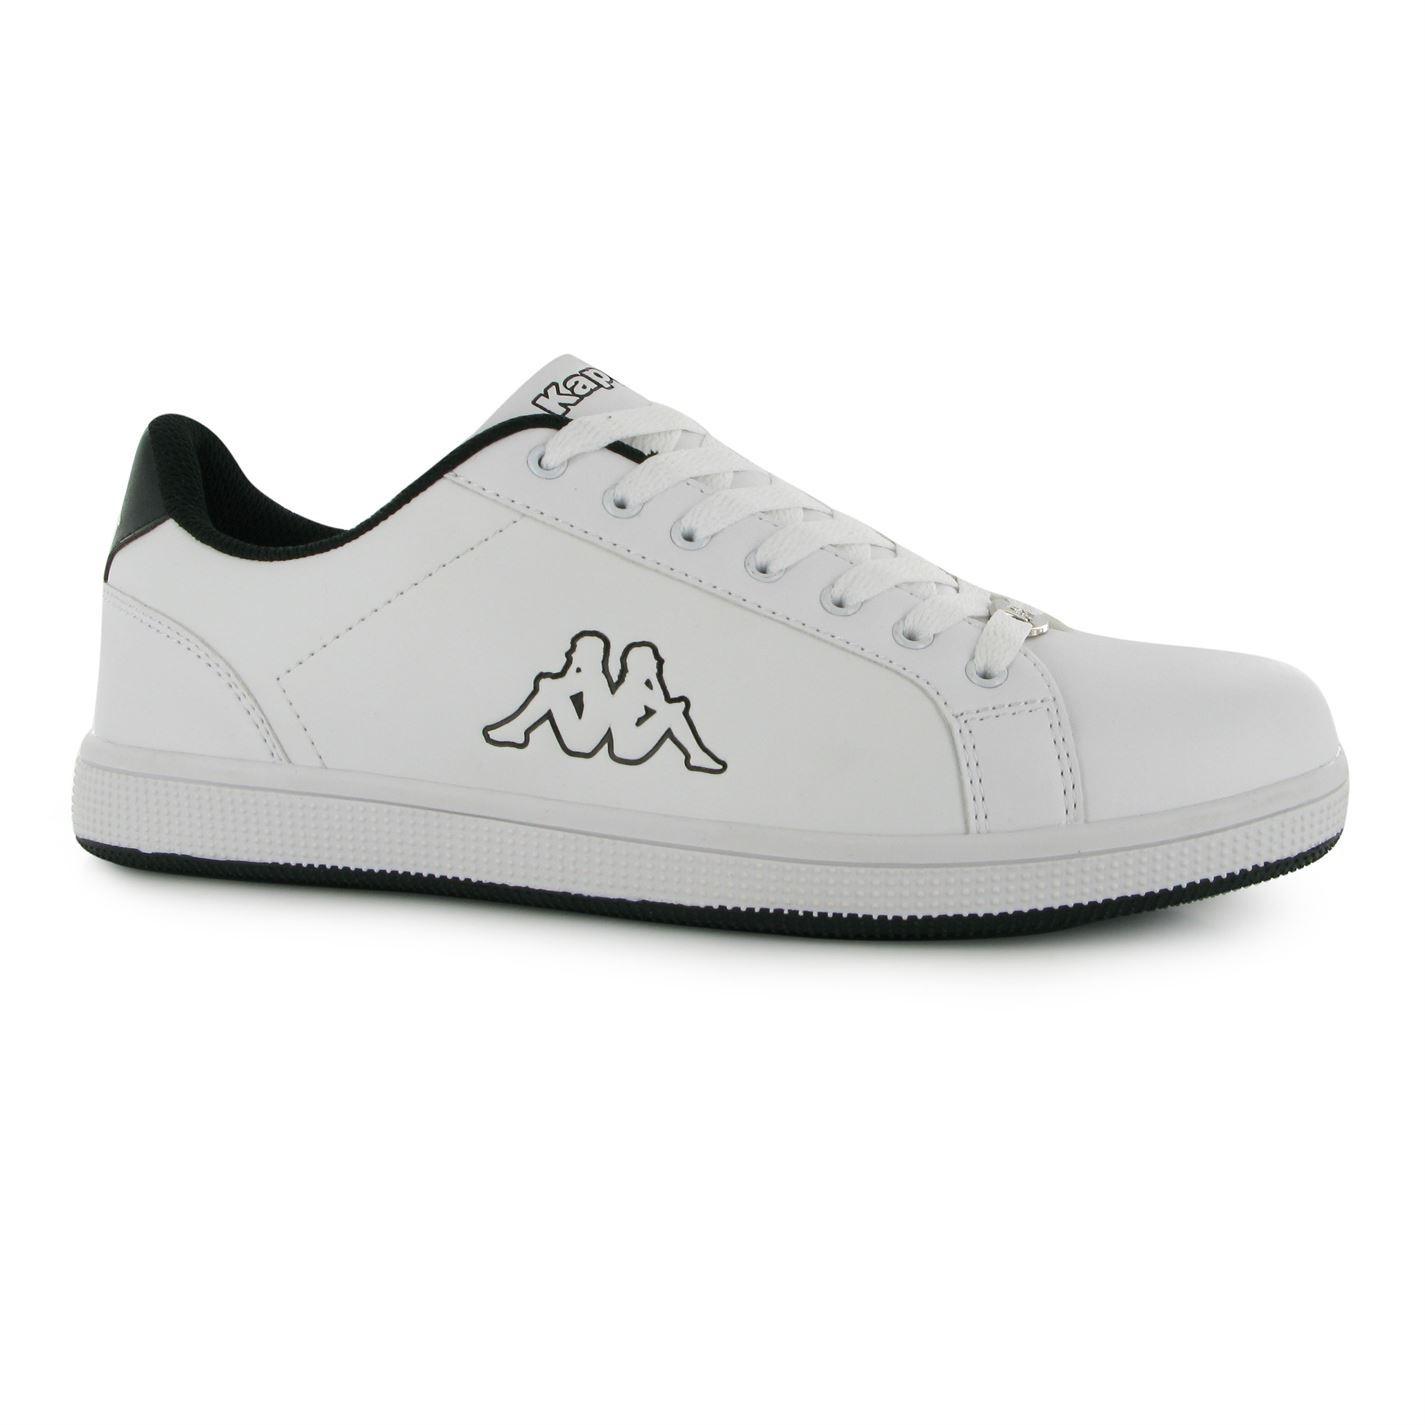 Kappa Maresas 2 Trainers Mens White/Black Sports Shoes ...